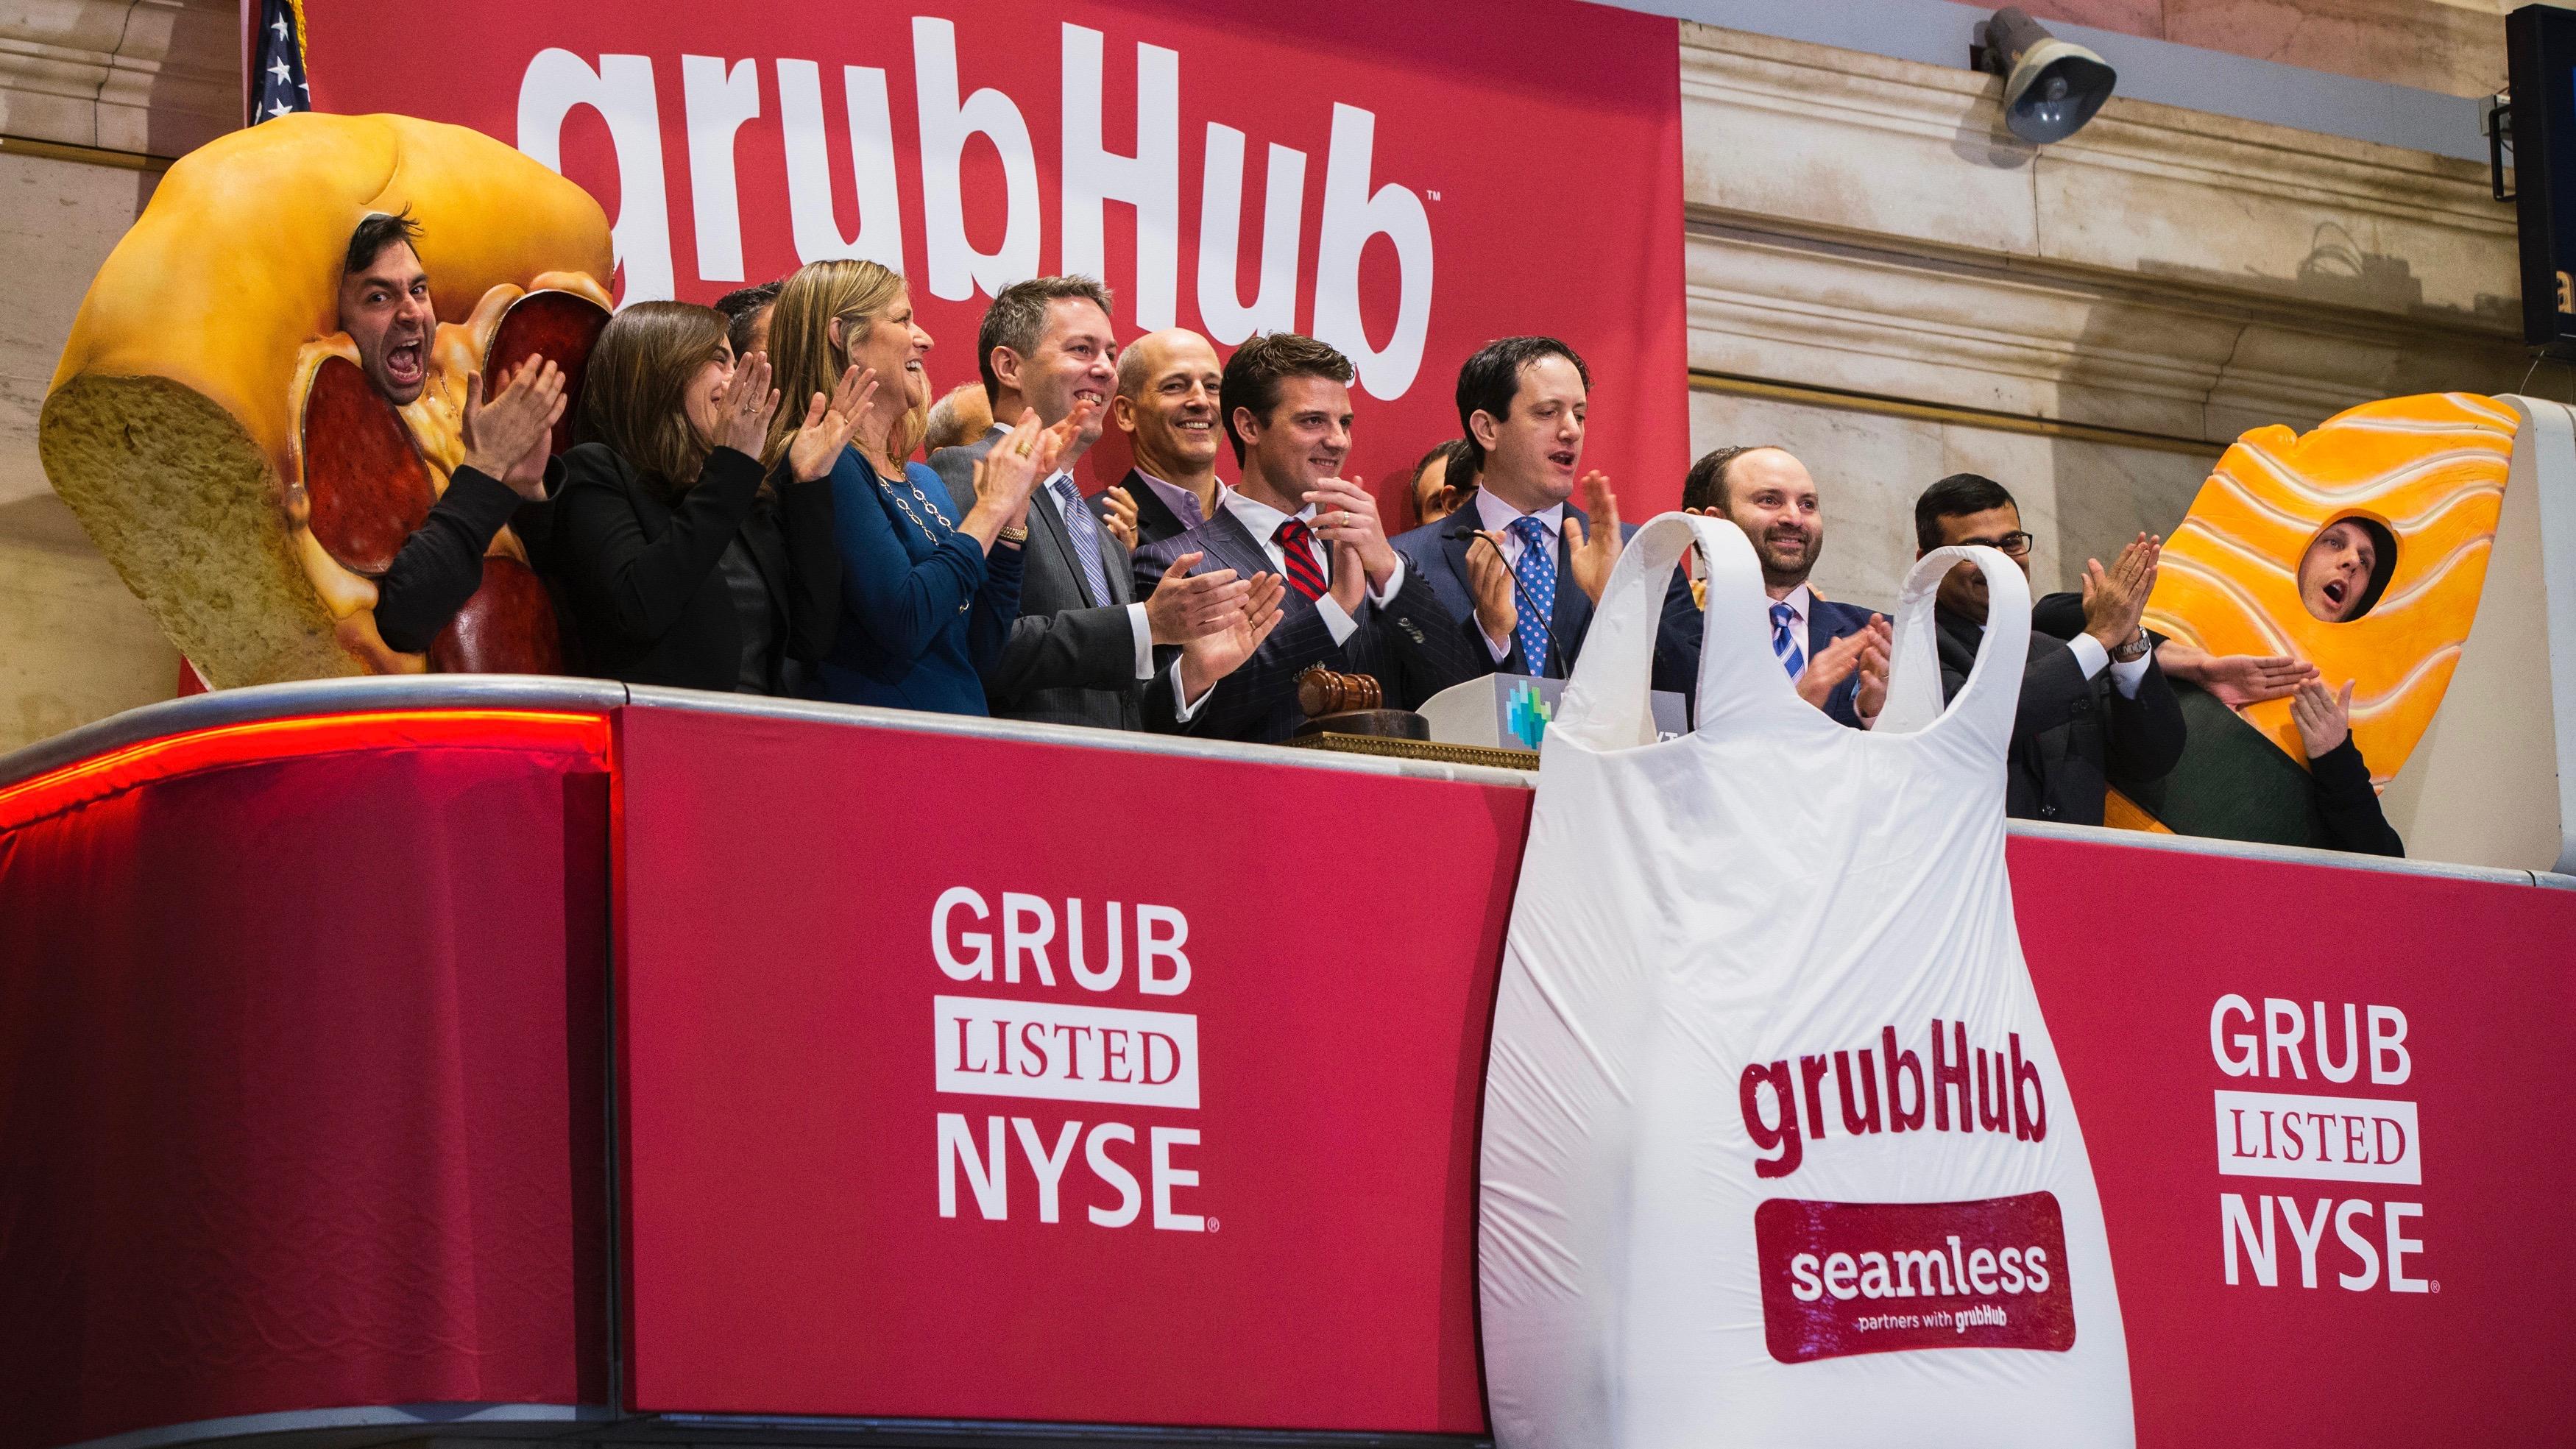 GrubHub COO testifies that the company's core business isn't food